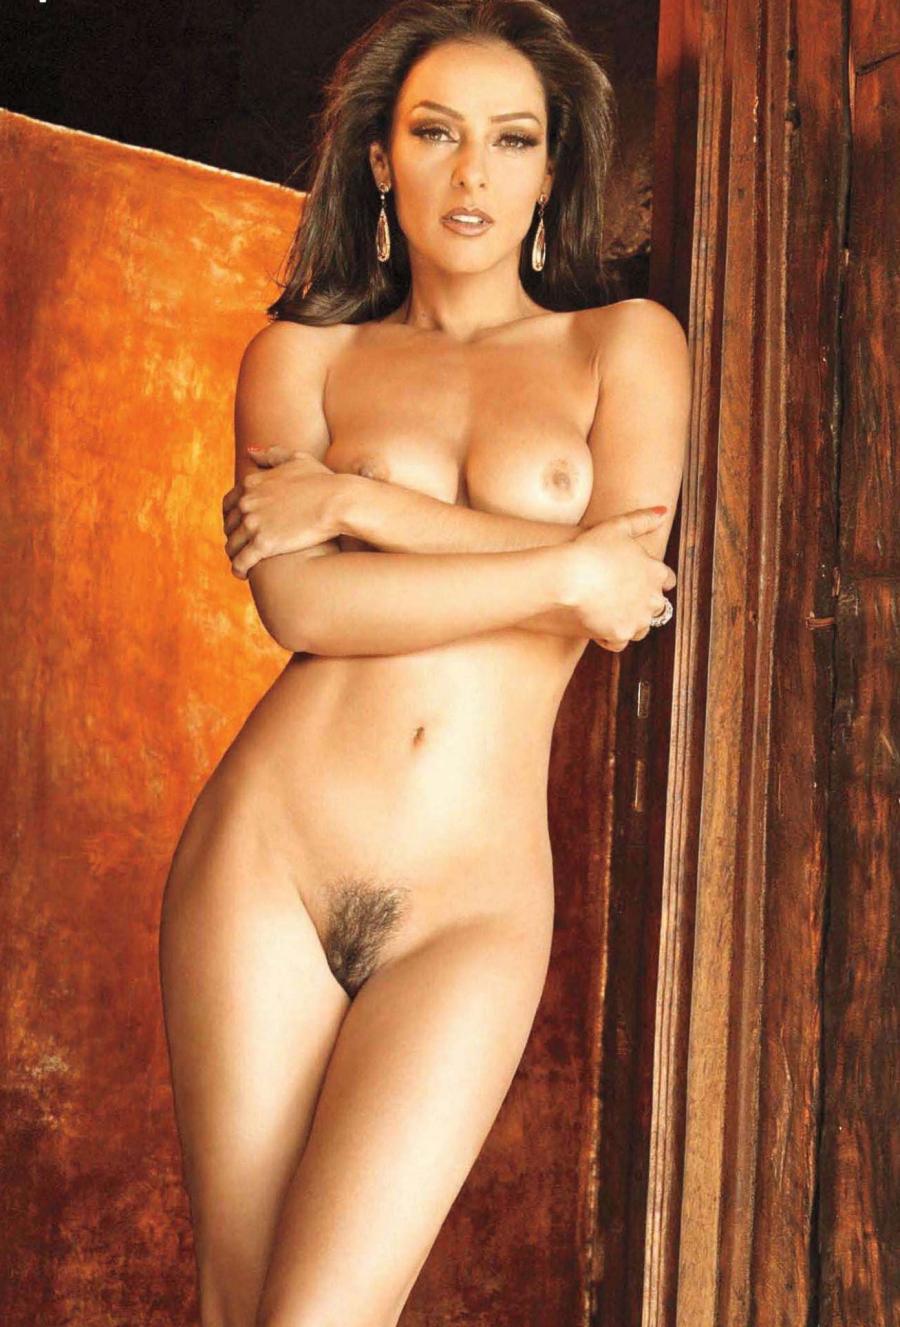 Ana Garcia Siñeriz Topless jimena garcia nude leaked photos   icloud leaks of celebrity